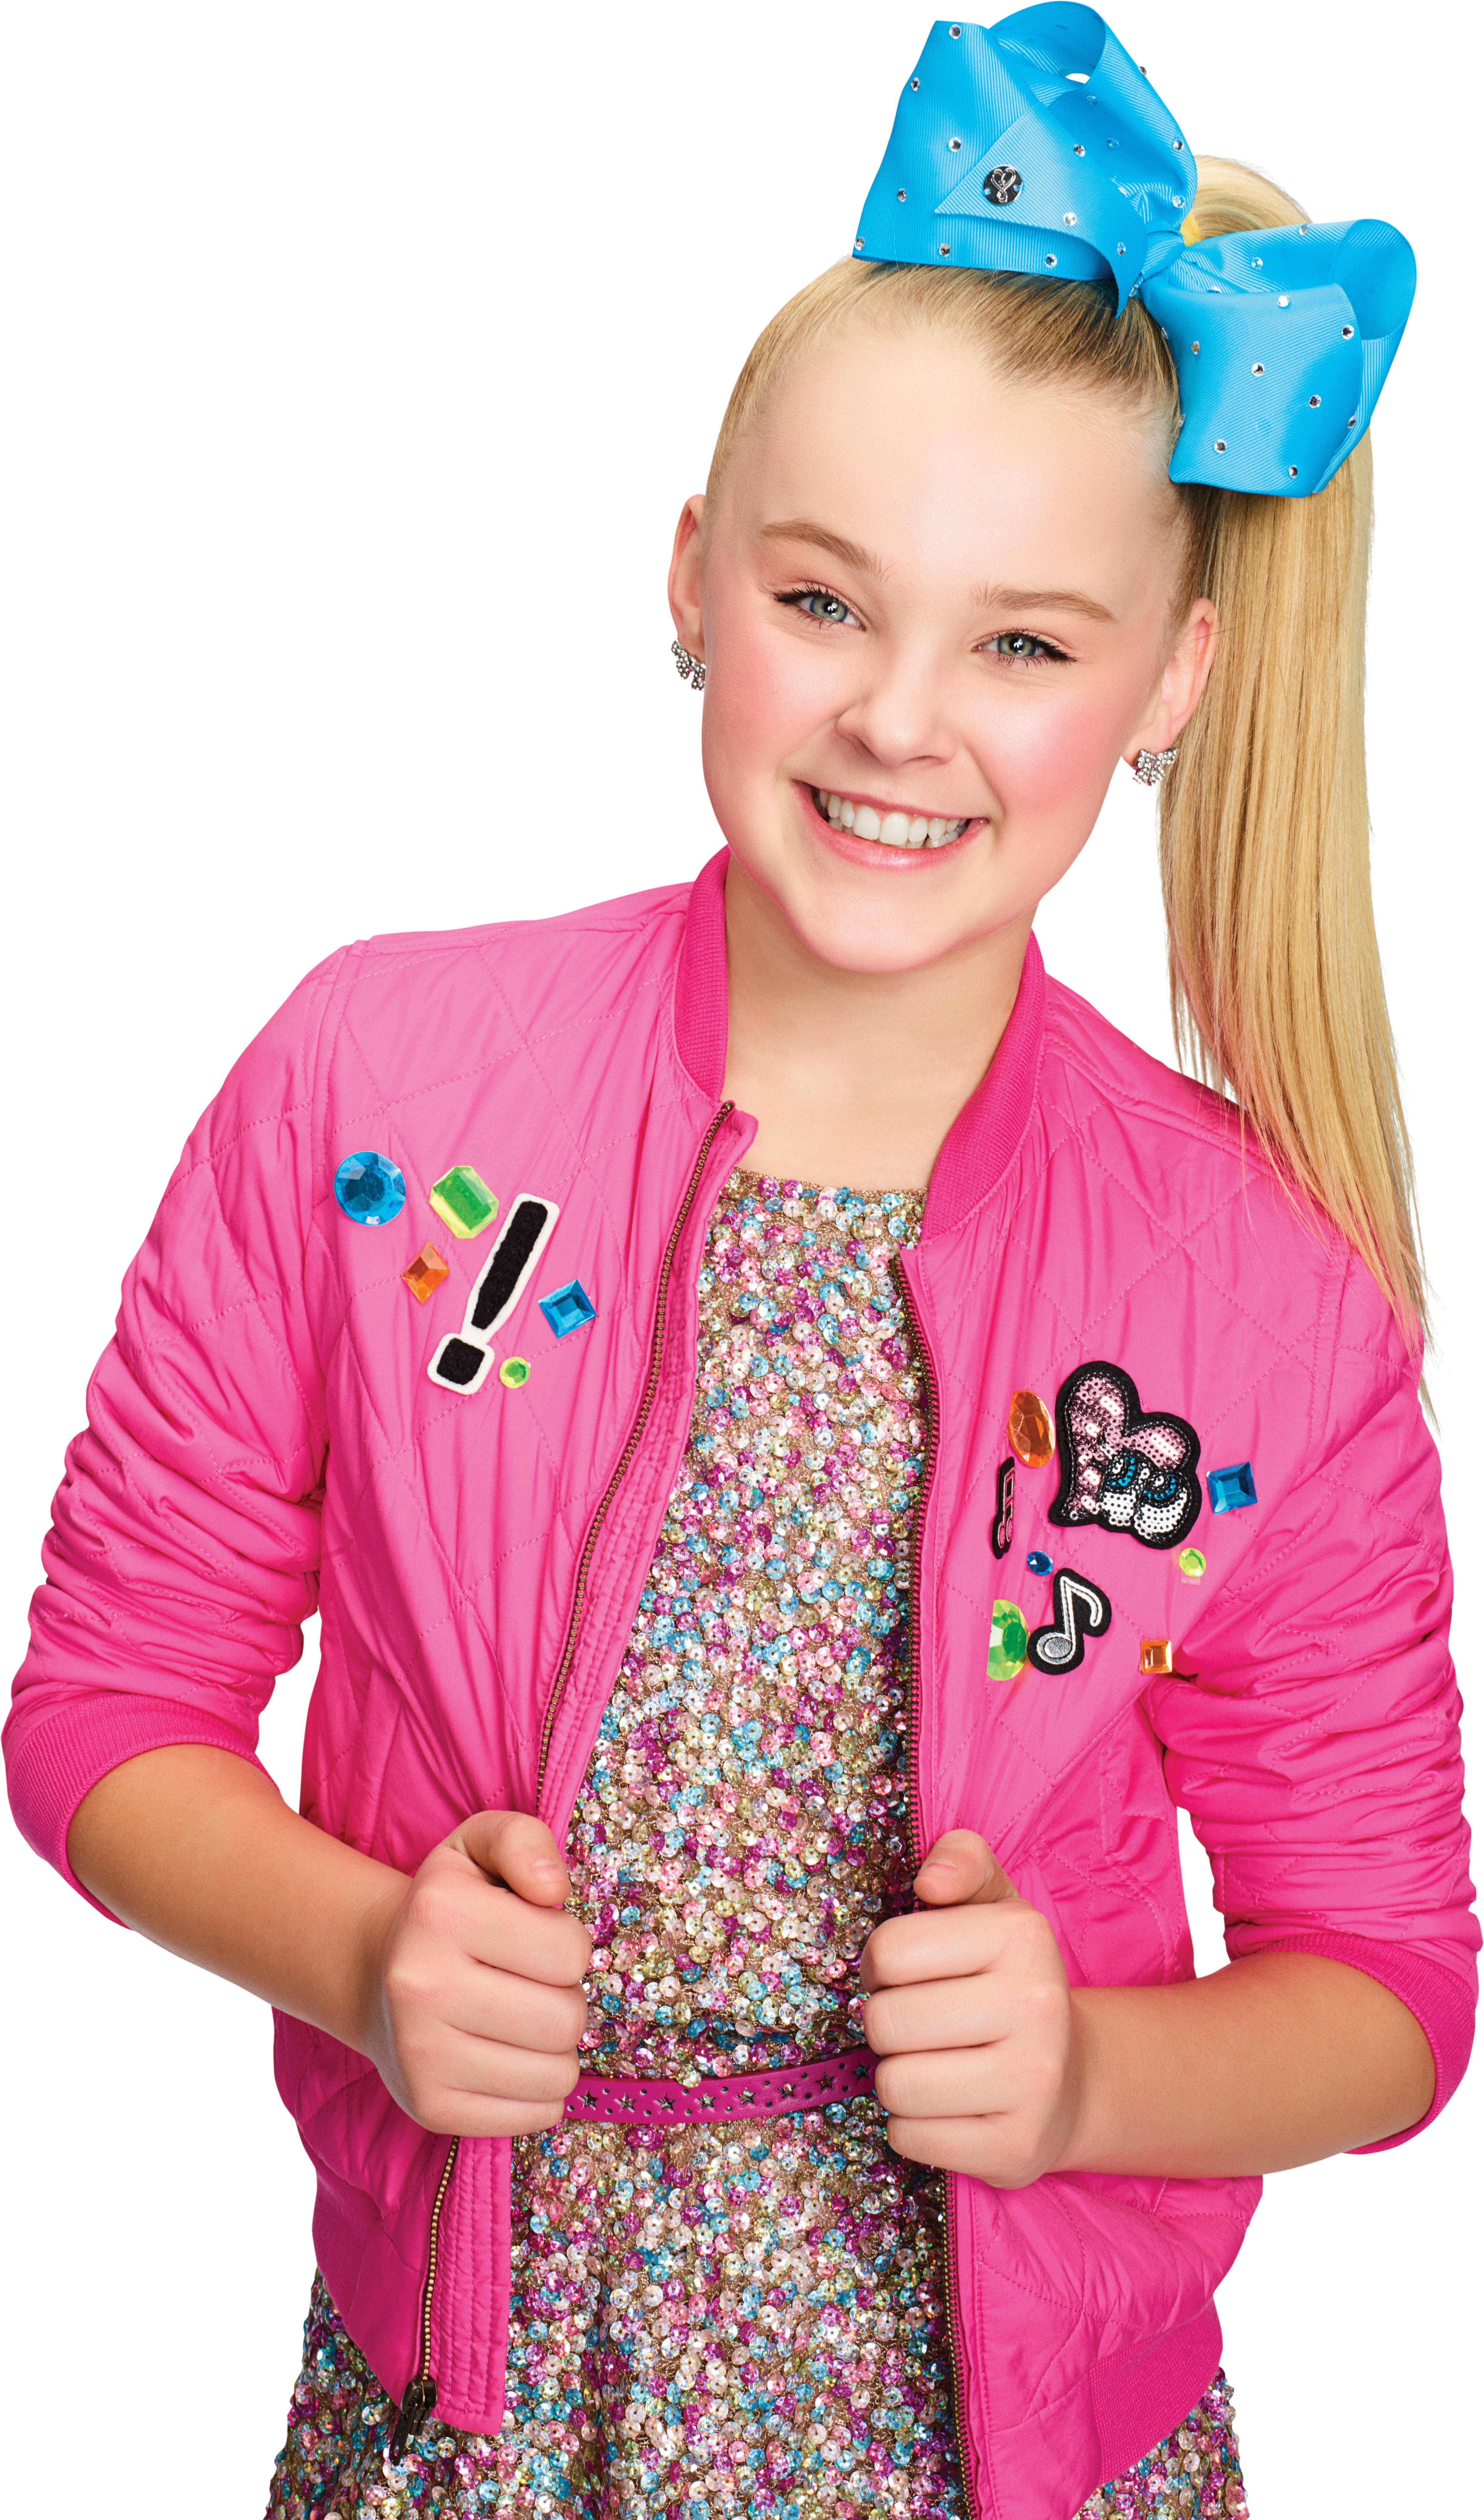 Pictured: JoJo Siwa Nickelodeon. Photo: Terry Doyle/Nickelodeon. © 2016 Viacom International, Inc. All Rights Reserved.